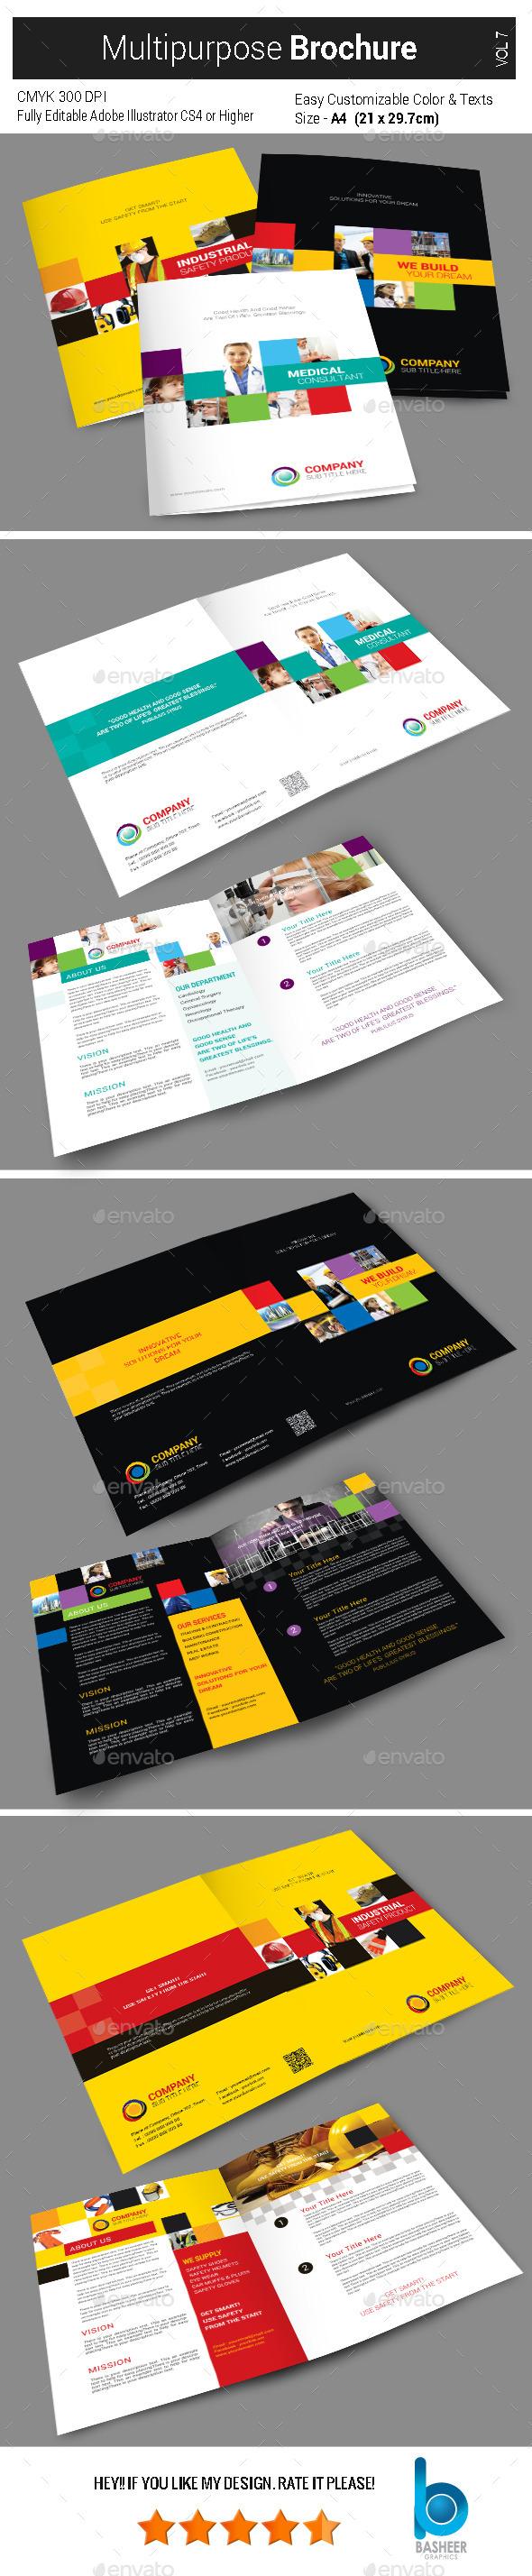 Multi Purpose Brochure - 4 Pages - Vol7 - Corporate Brochures